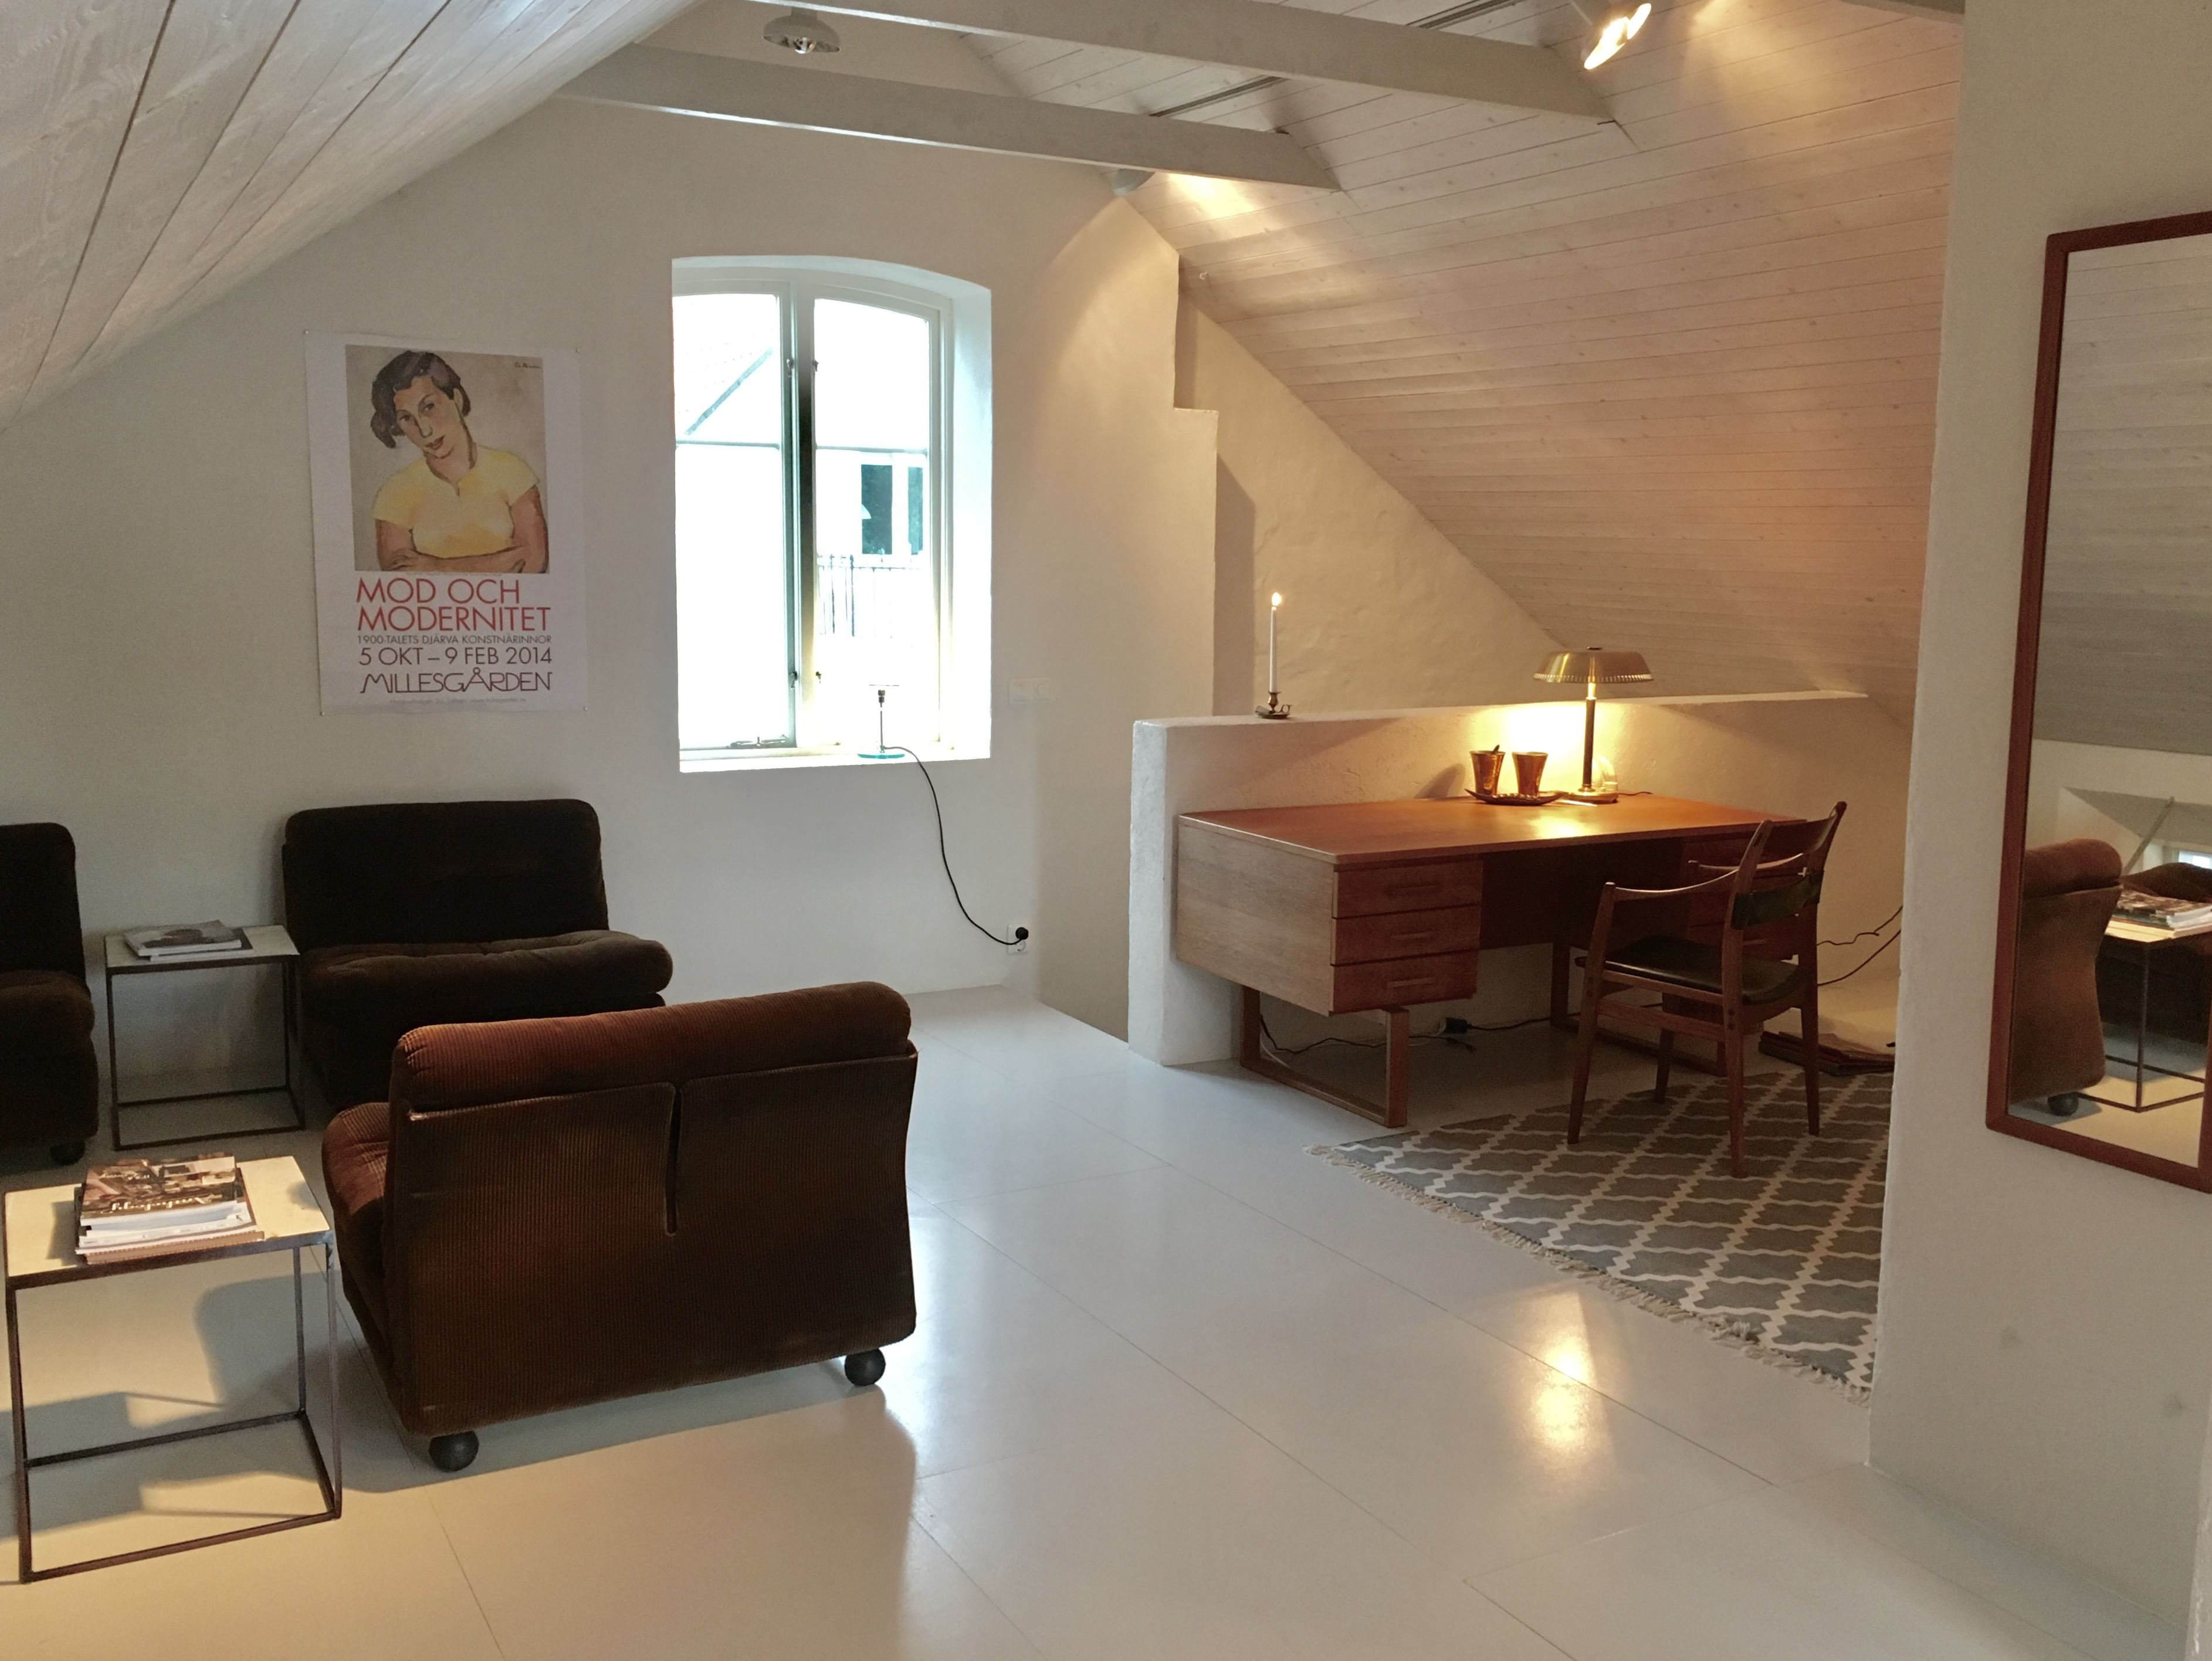 Foto: Marie Dennegård, A-läge eget hus, Höganäs